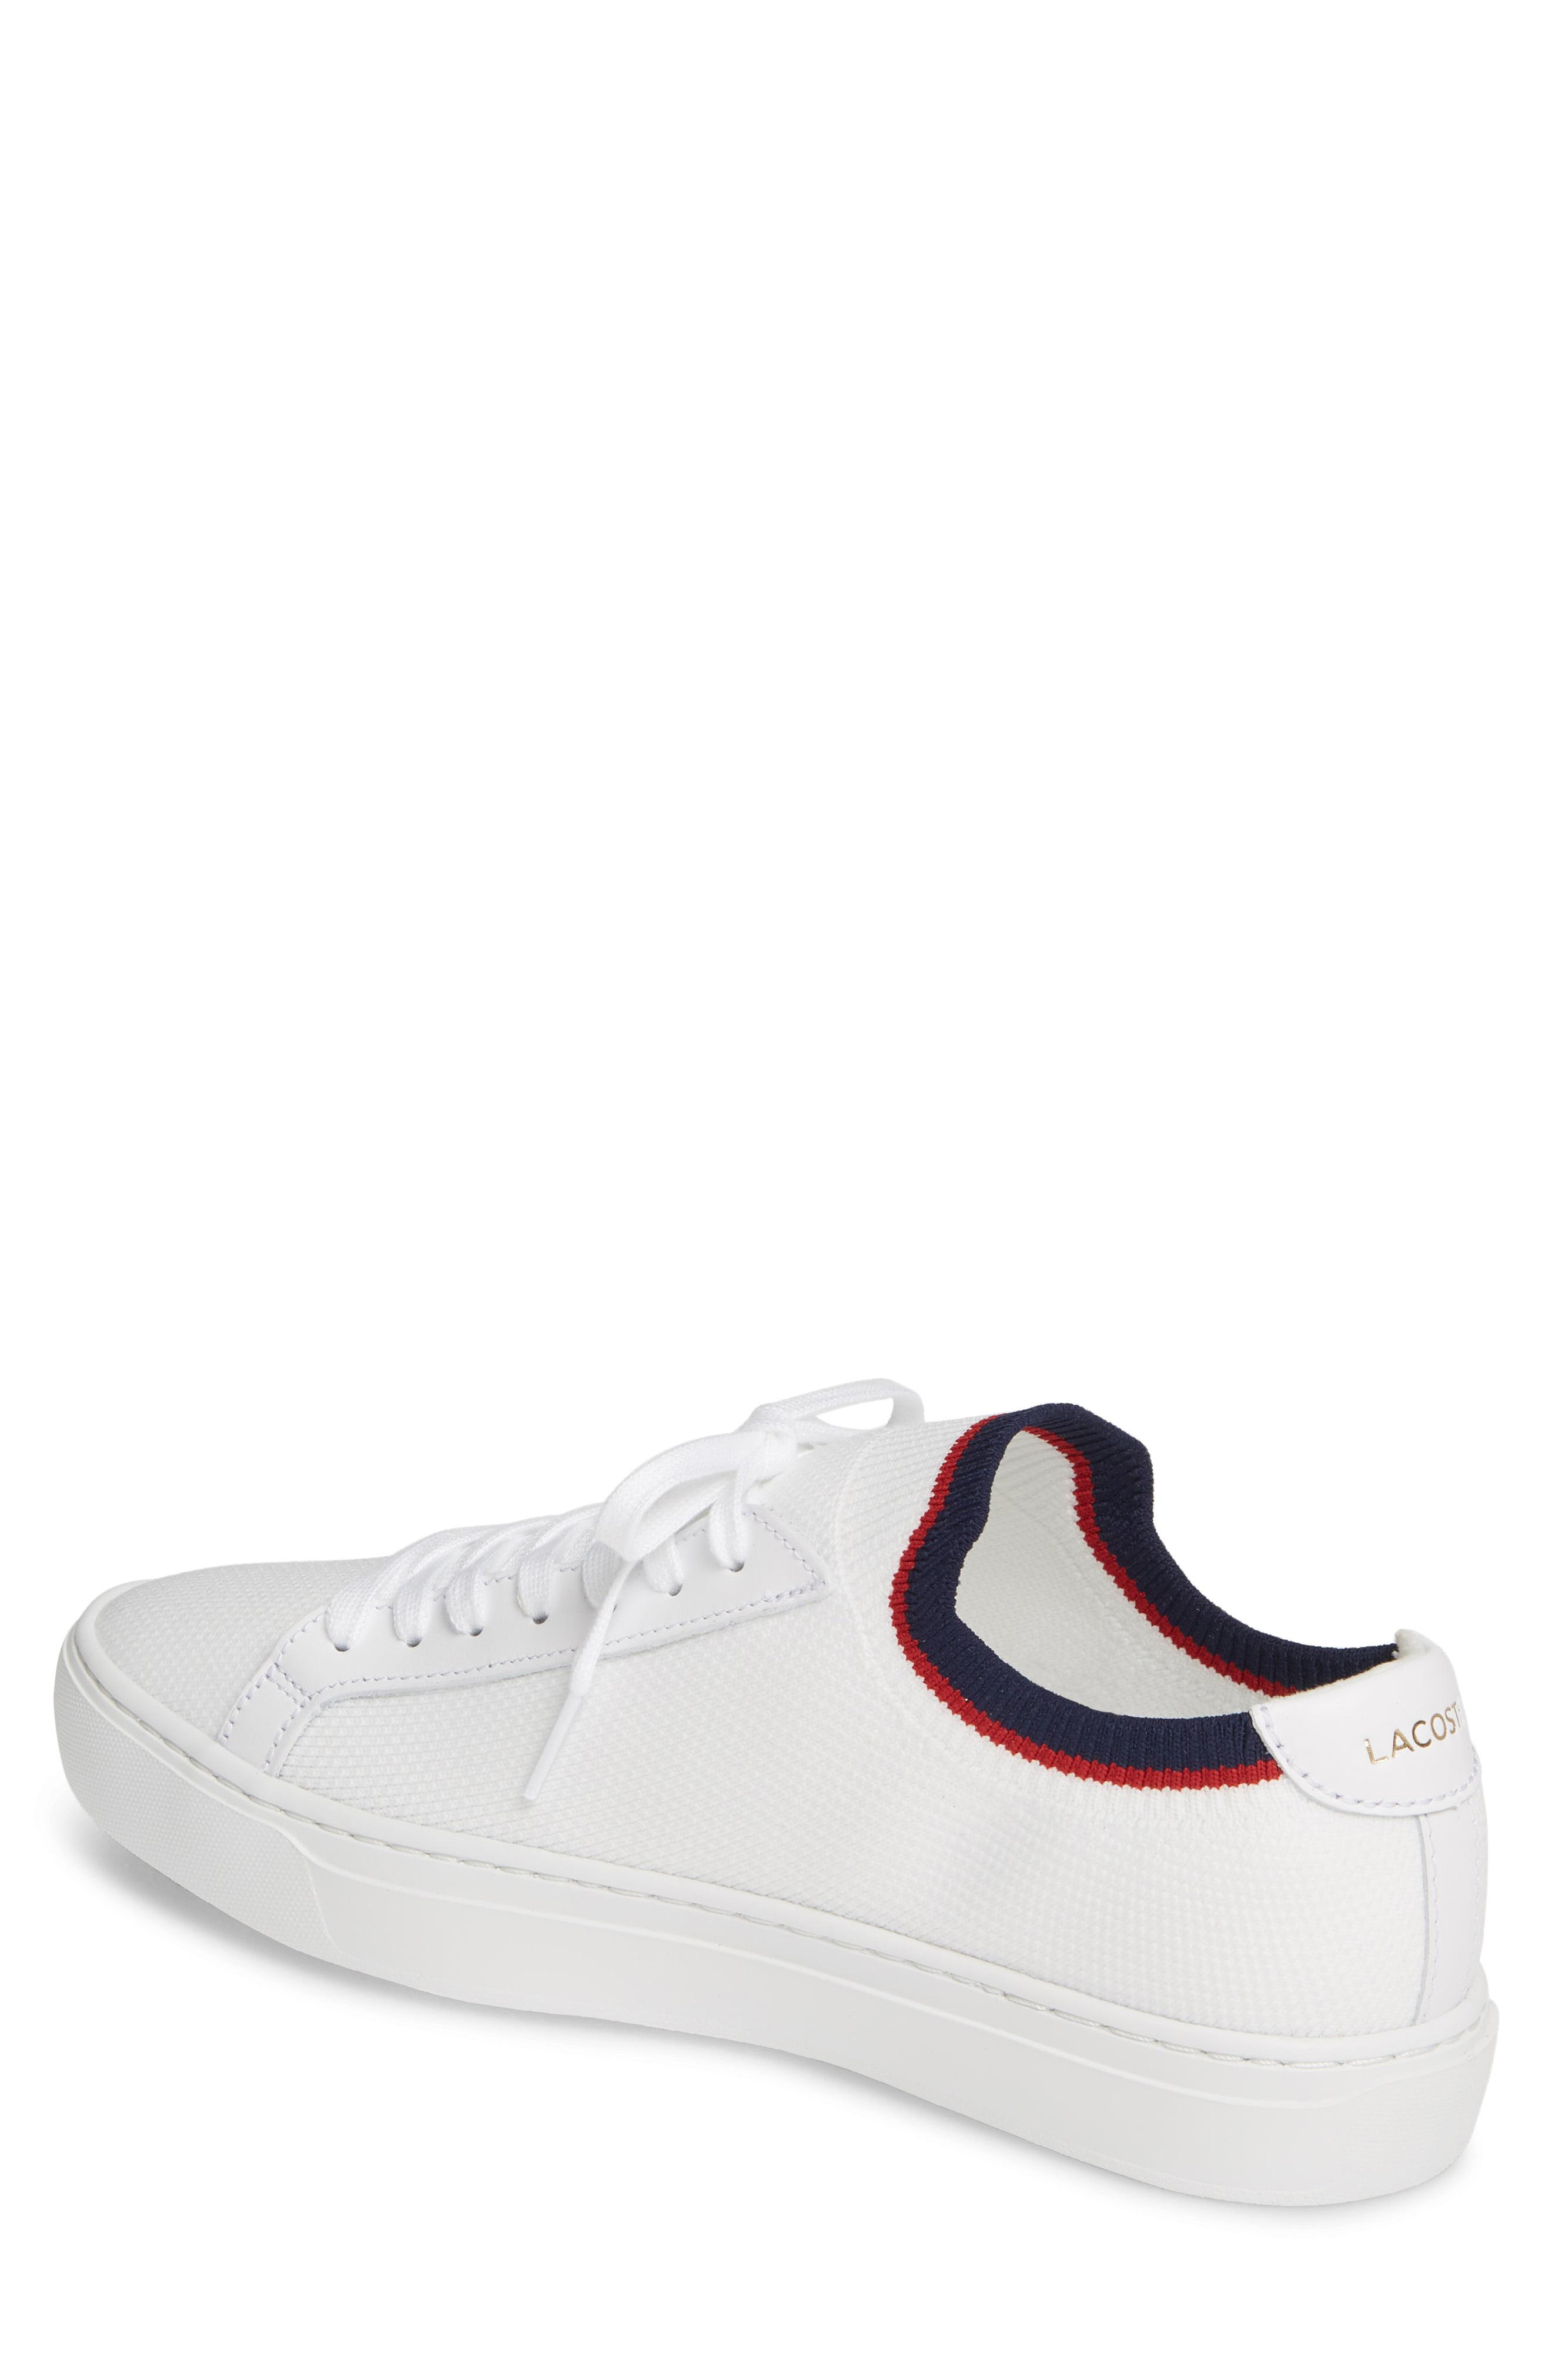 8f627de5764f Lacoste - White Piqué Knit Sneaker for Men - Lyst. View fullscreen